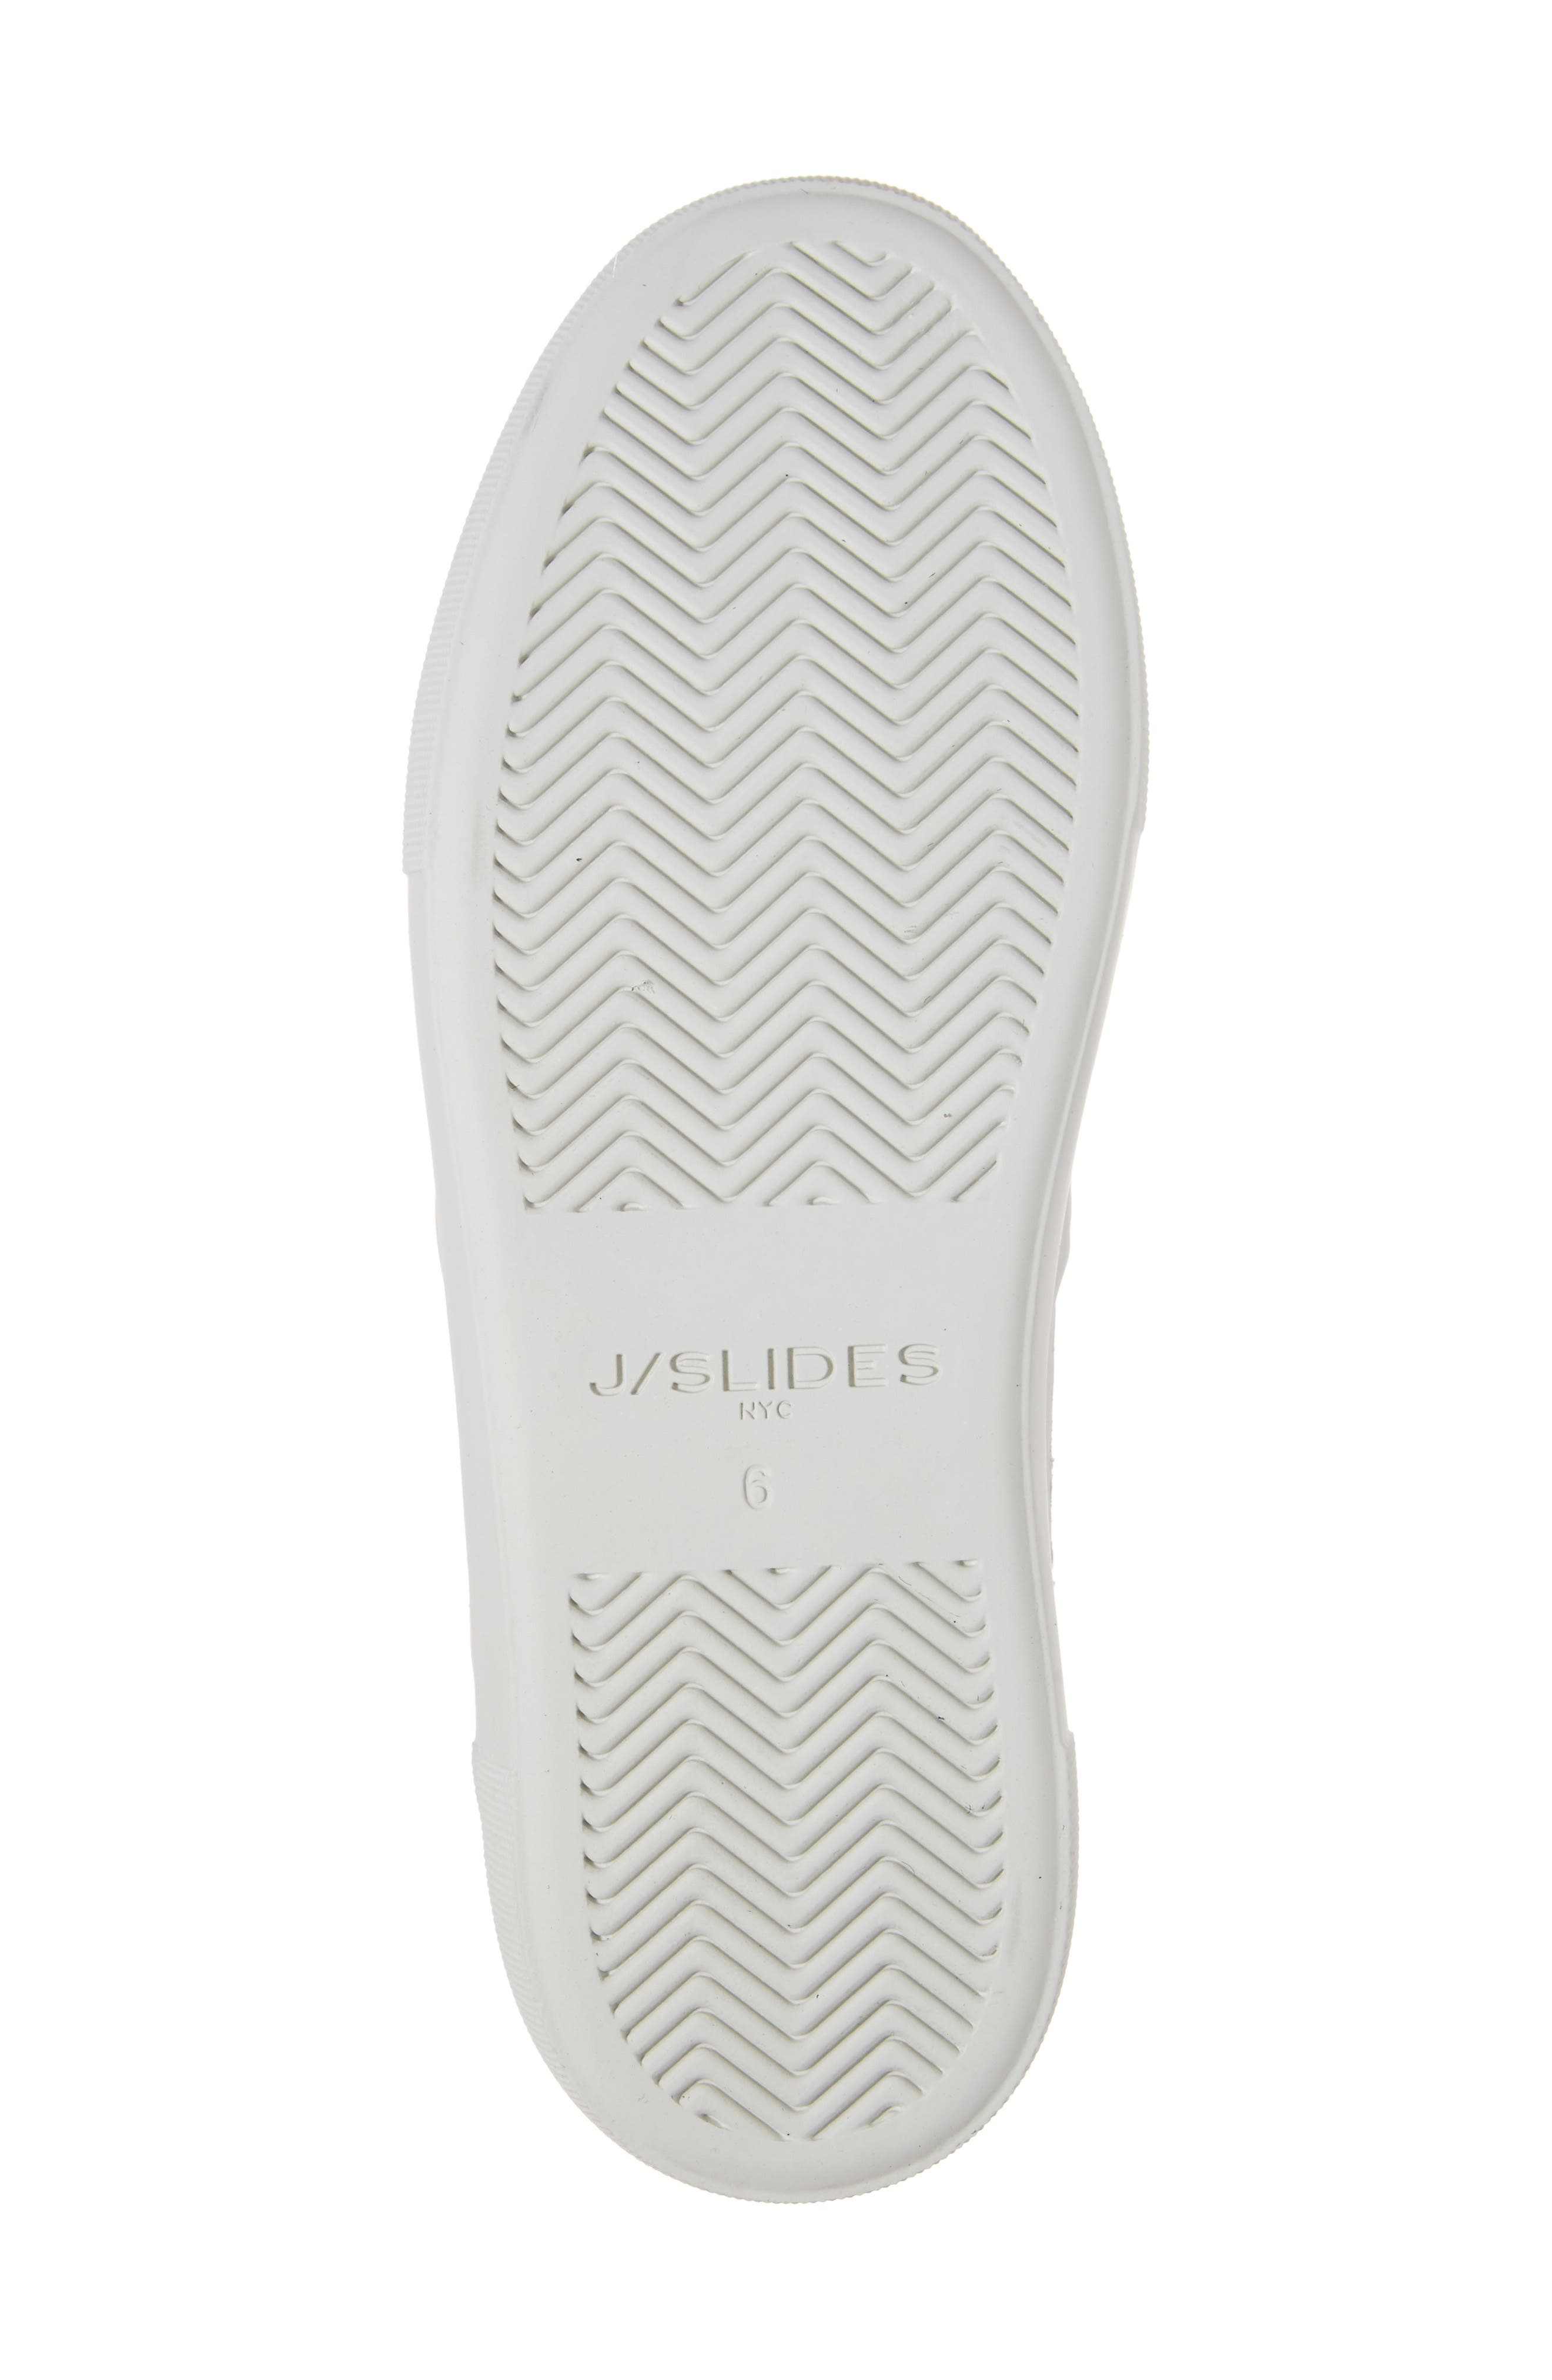 Arpel Faux Fur Lined Slip-On Sneaker,                             Alternate thumbnail 6, color,                             Black Suede